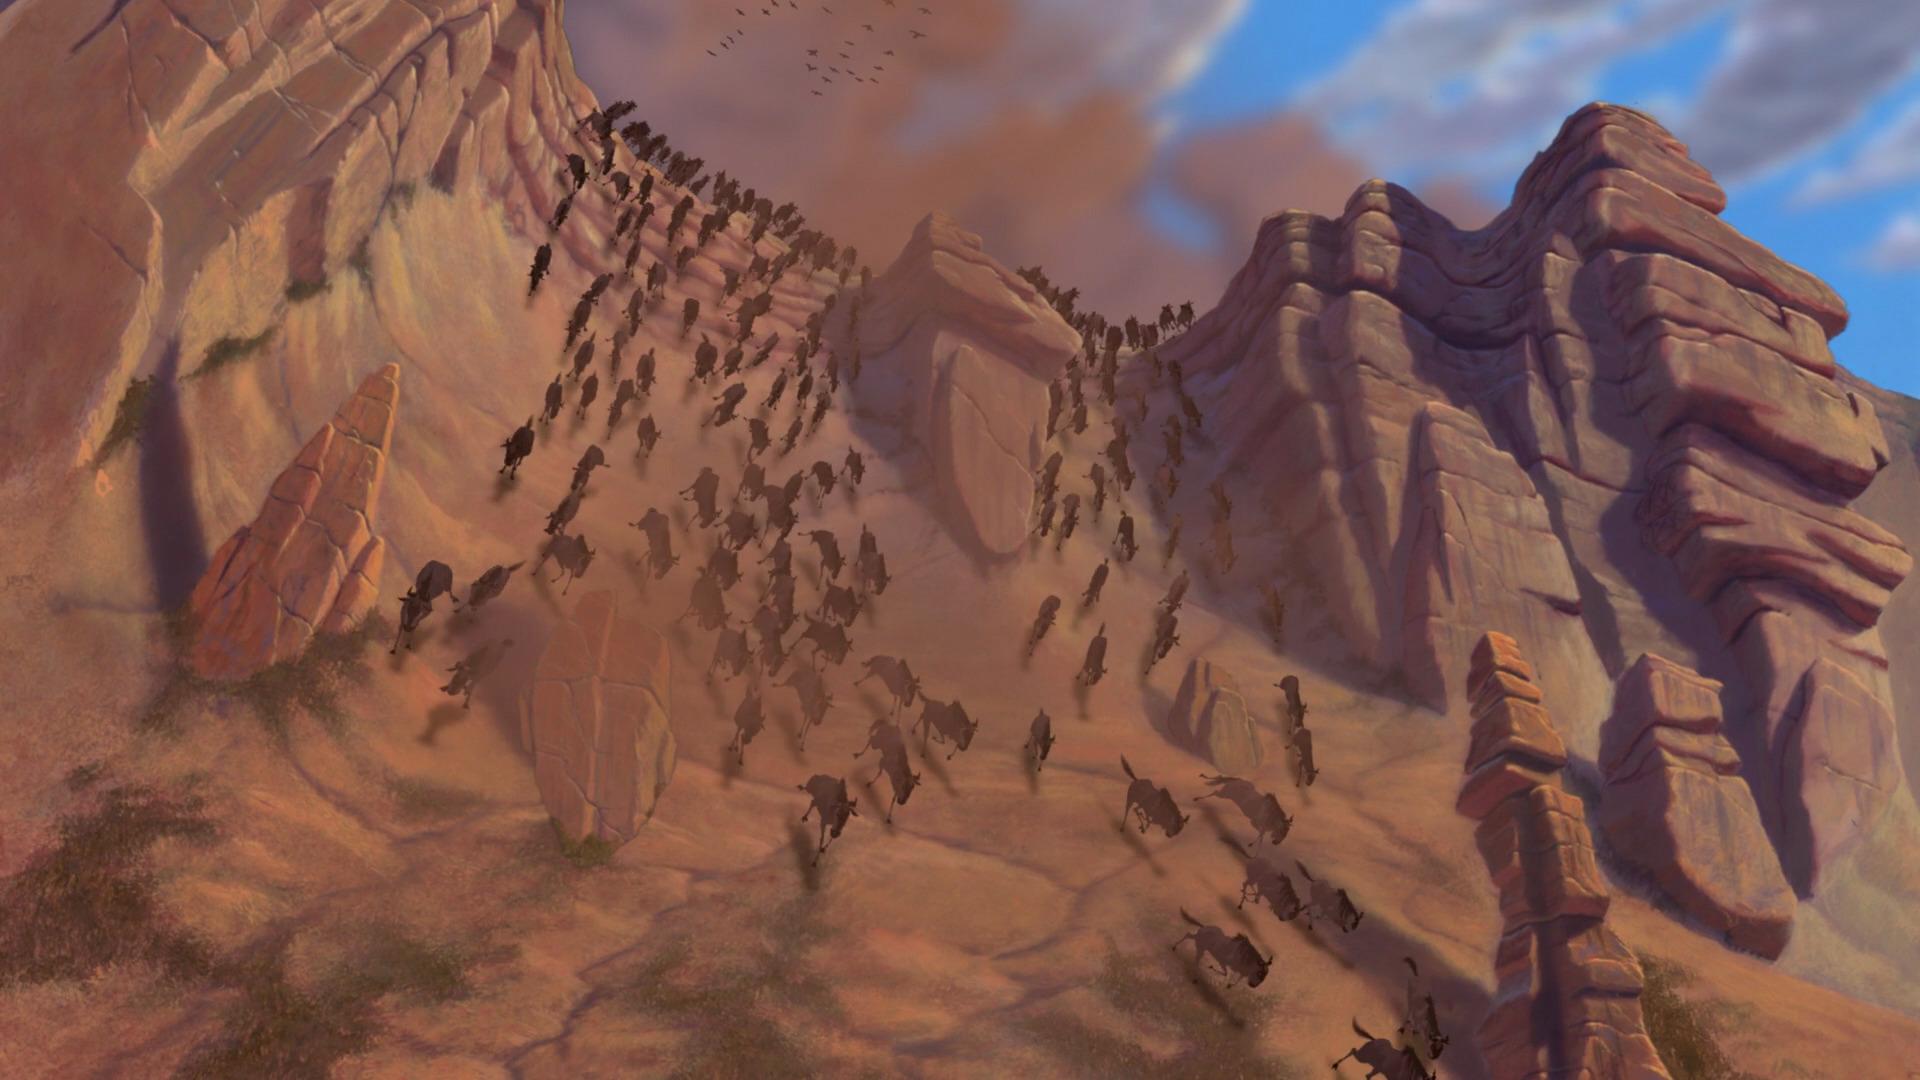 he-lion-king-live-action-wildebeests-stampede